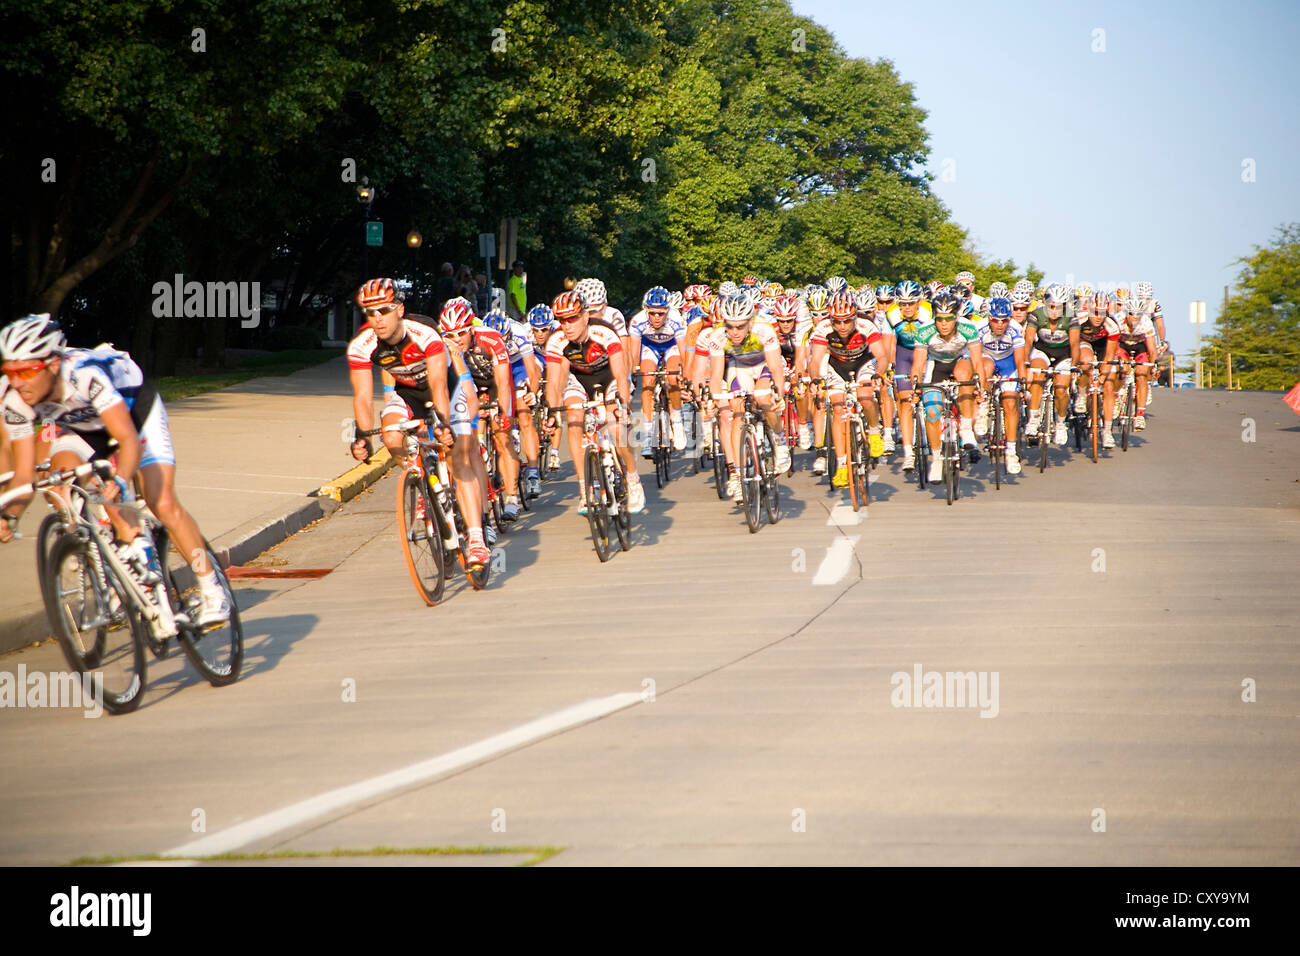 Tour of Missouri bike race - Stock Image